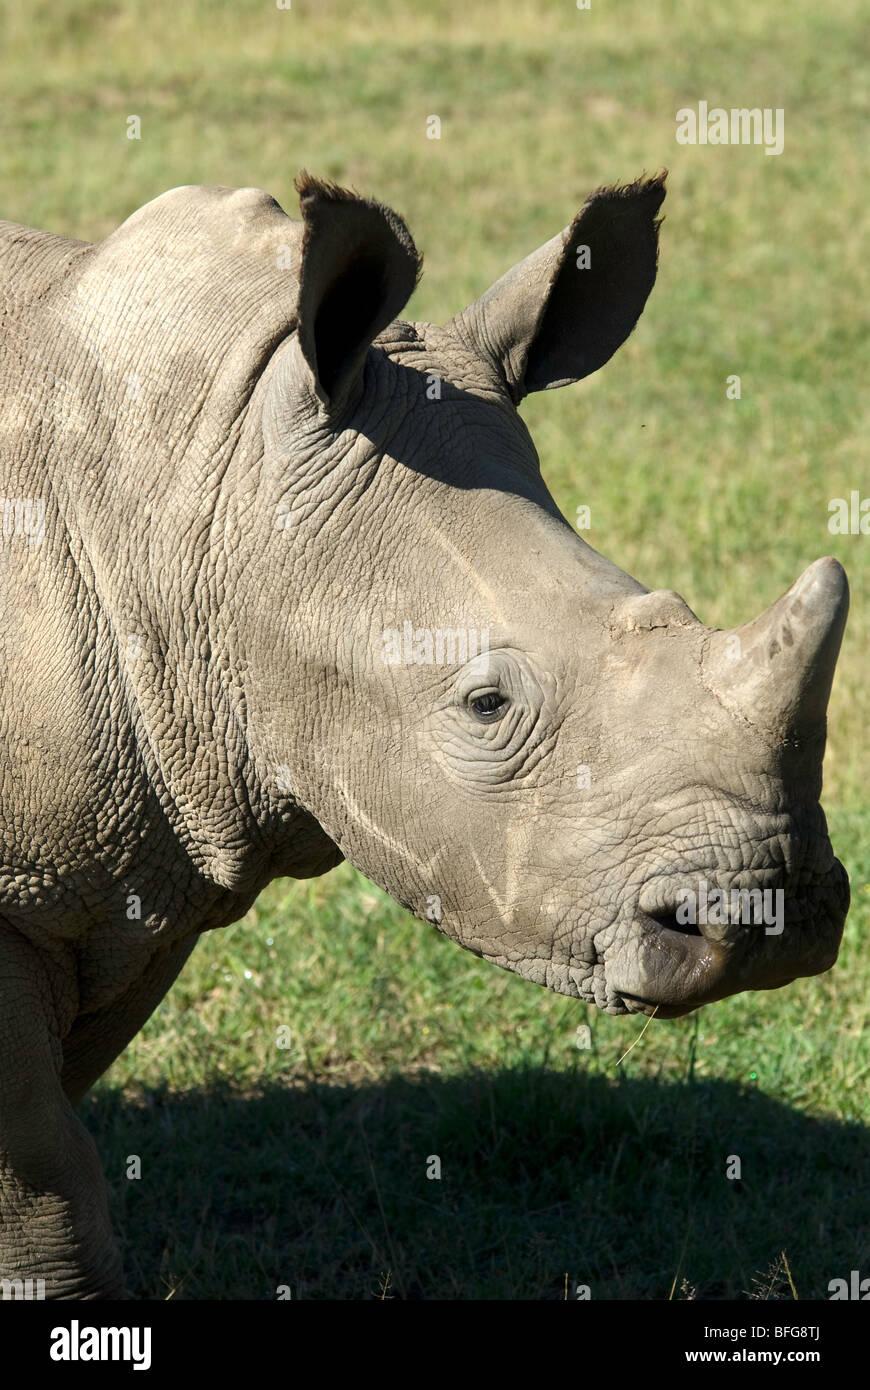 young white rhino - Stock Image